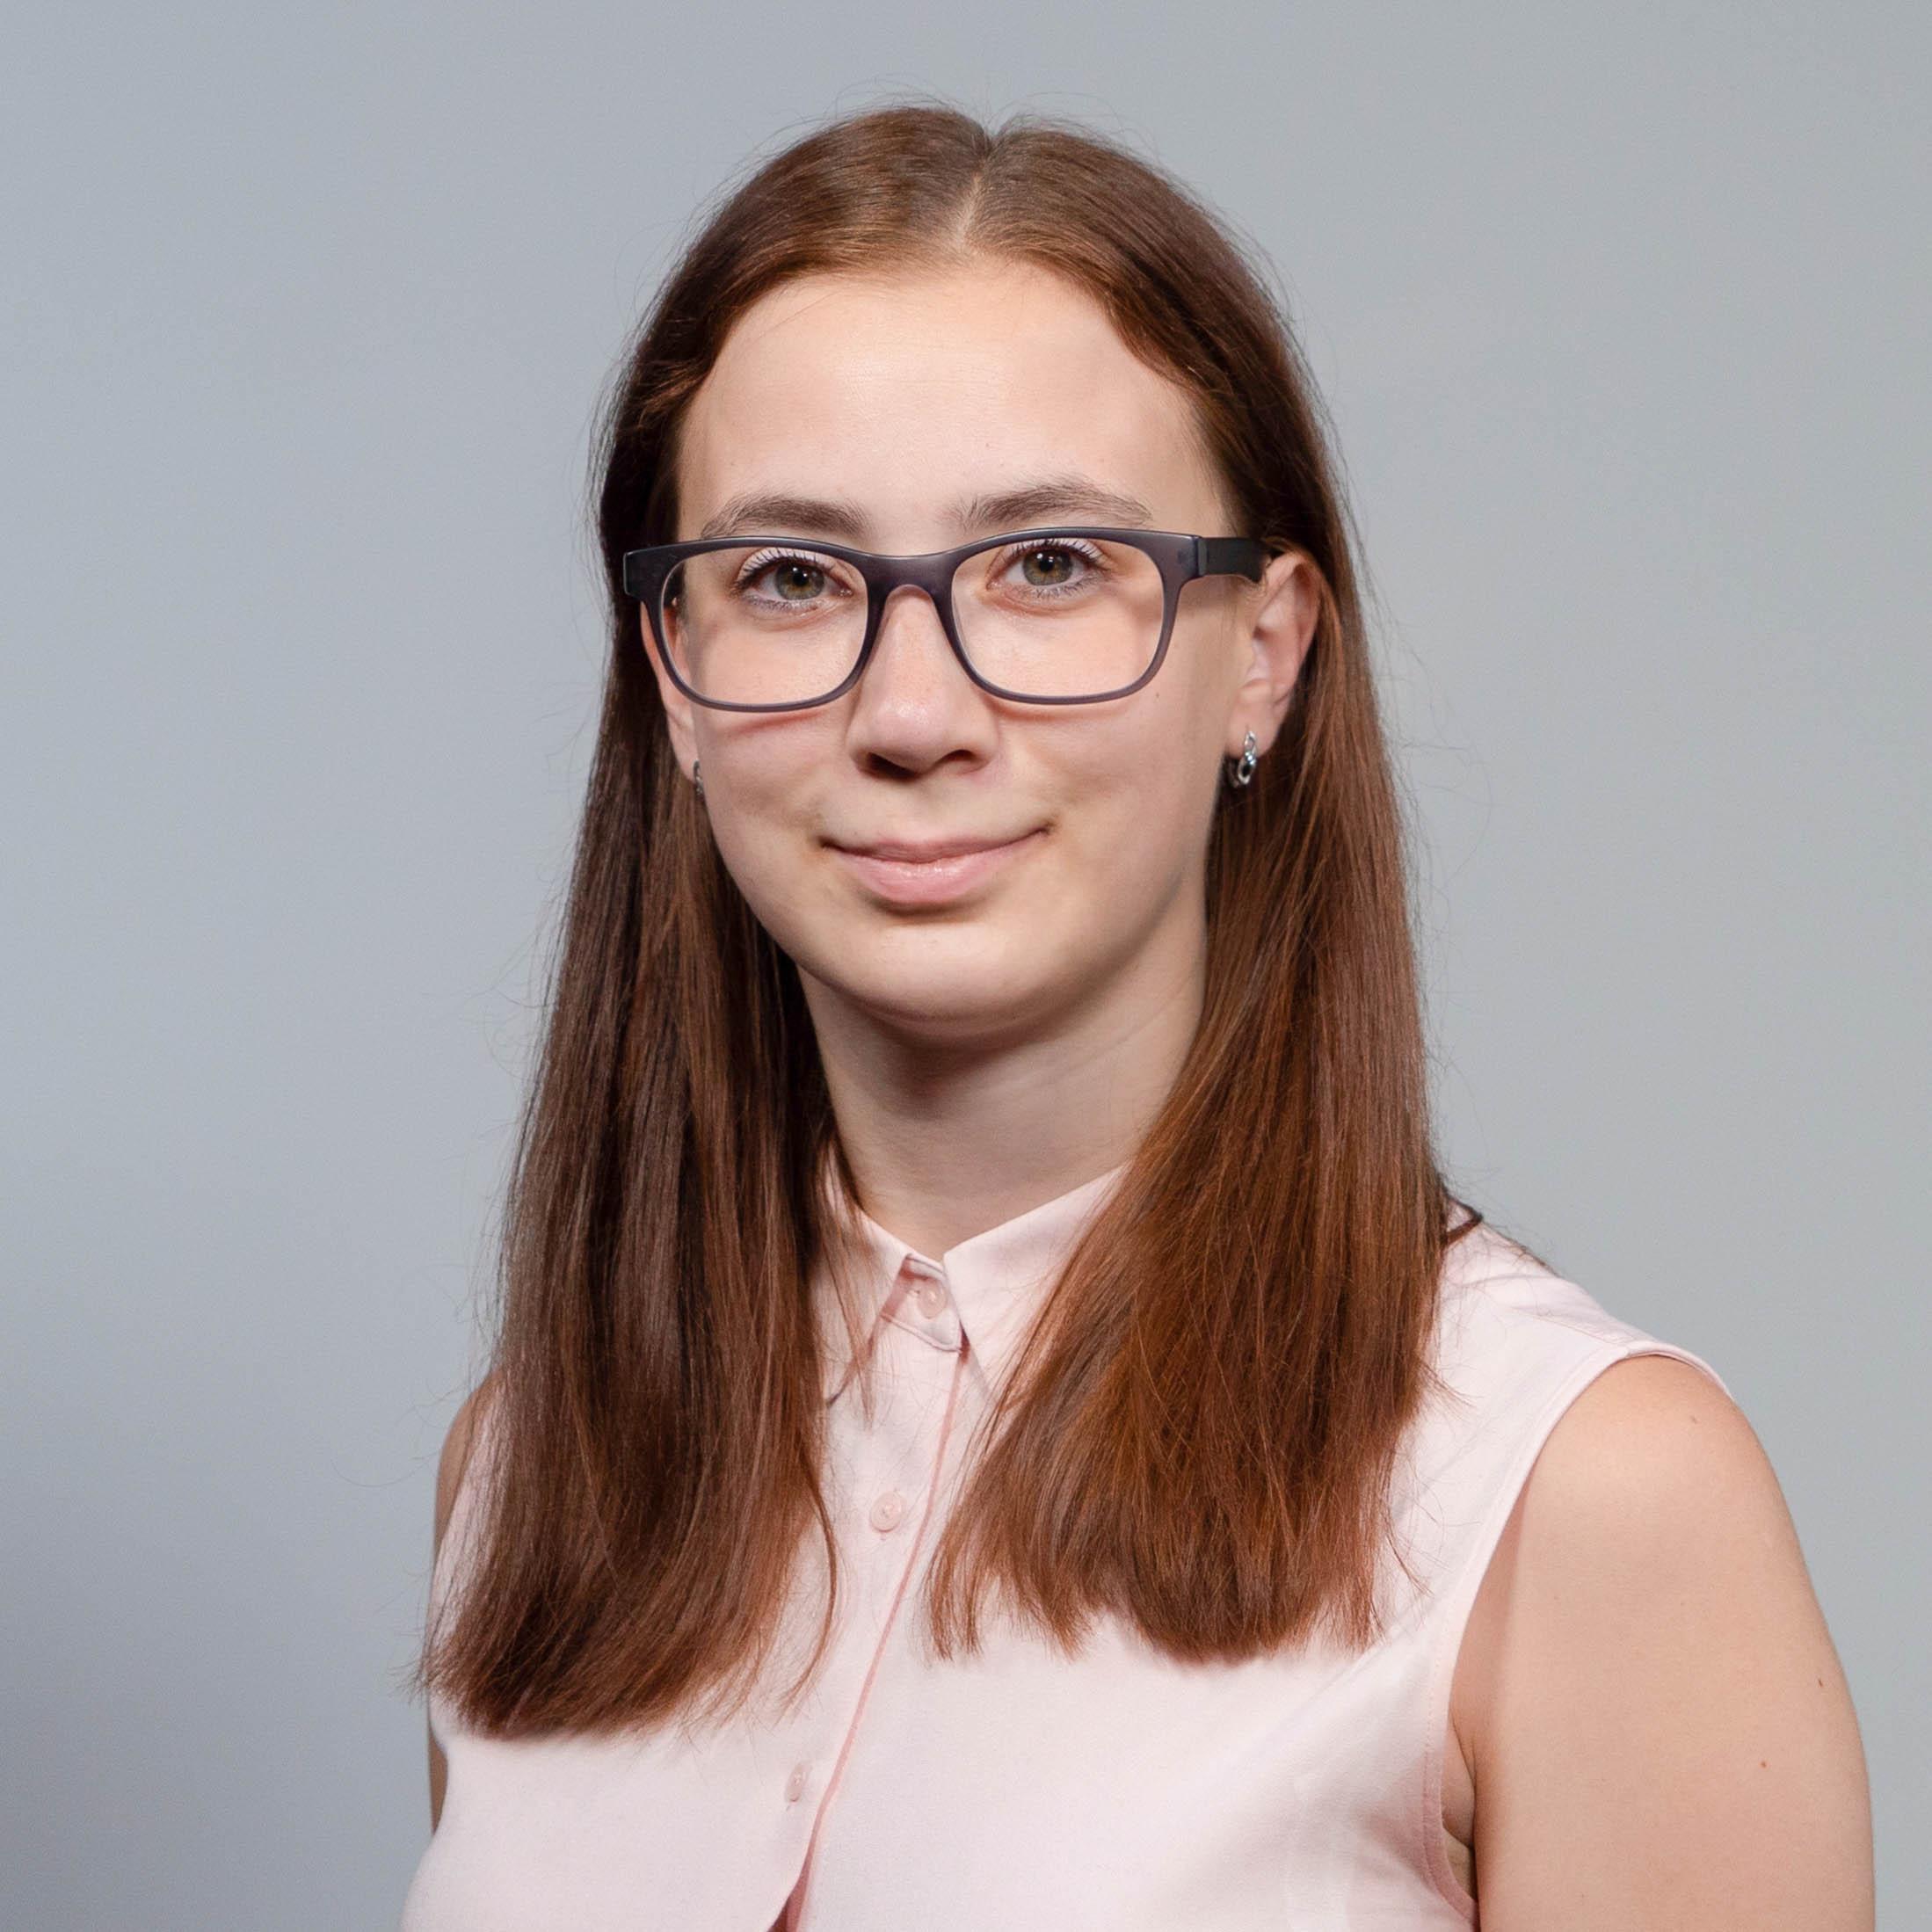 Нефедова Ольга Игоревна